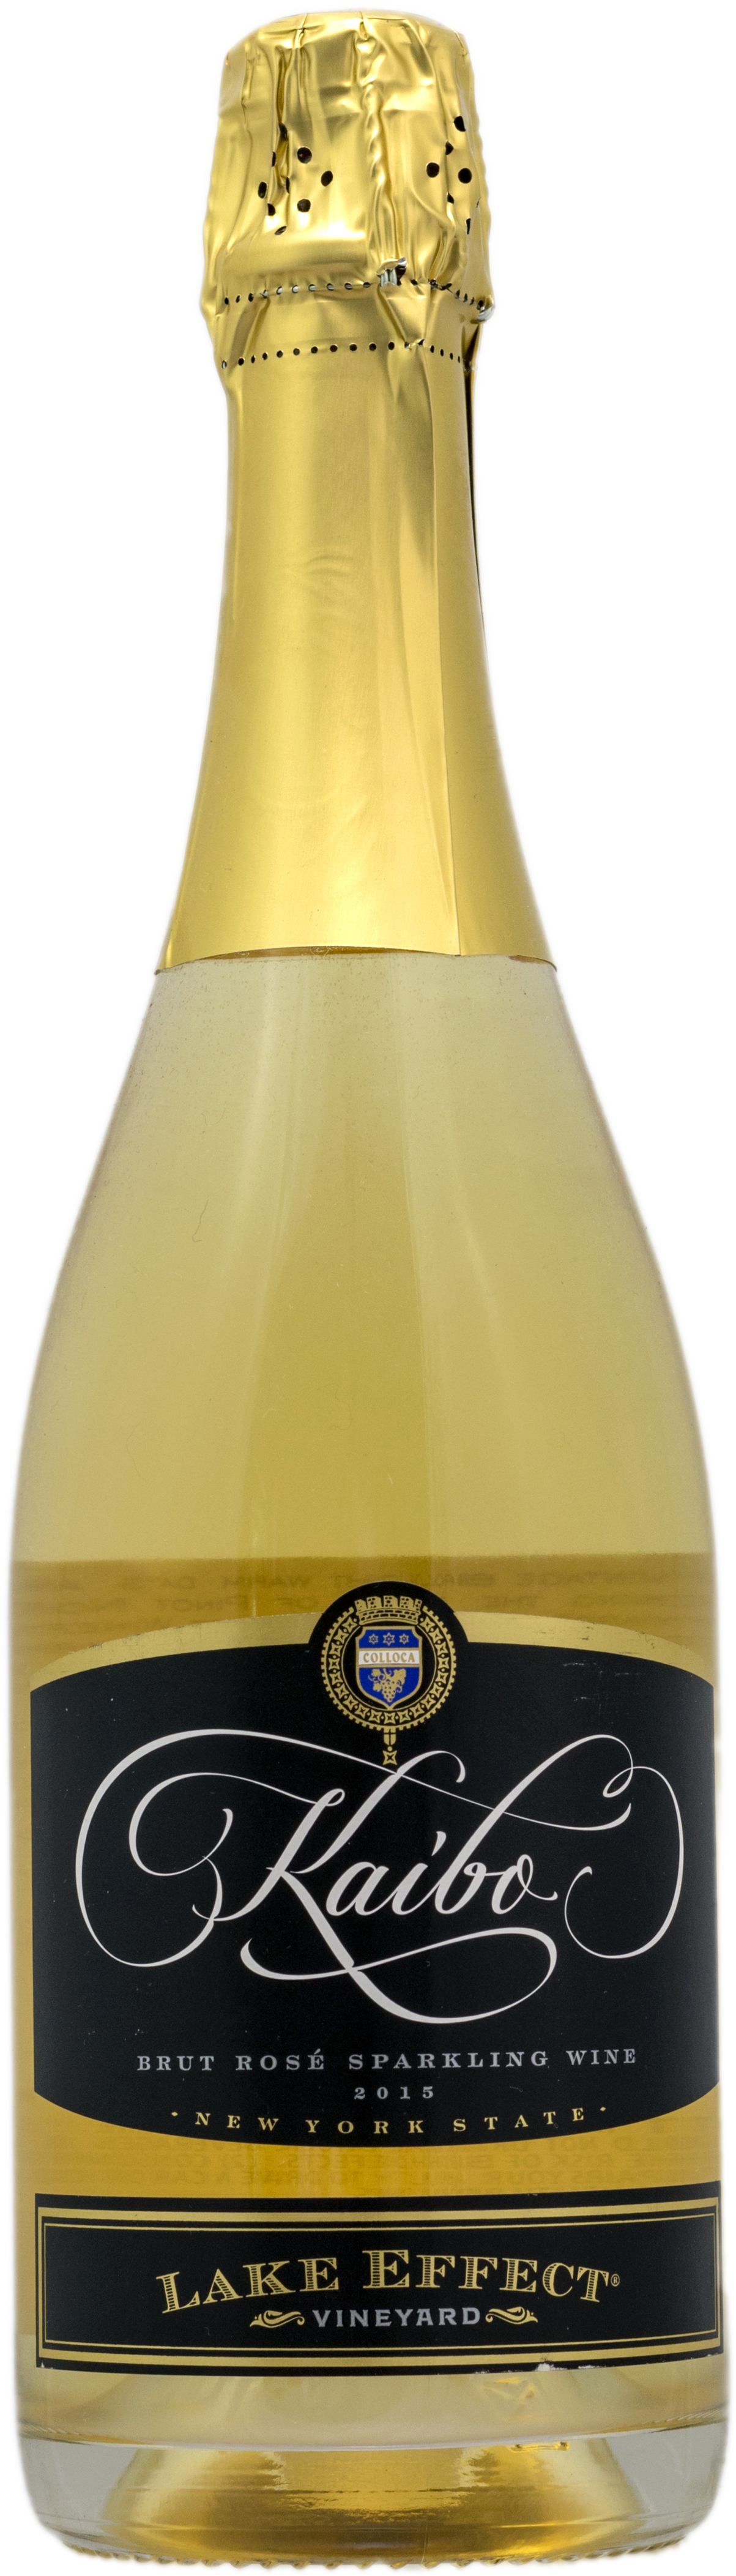 2015 Colloca Estate Lake Effect Vineyard® 'Kaibo Sparkling Brut -